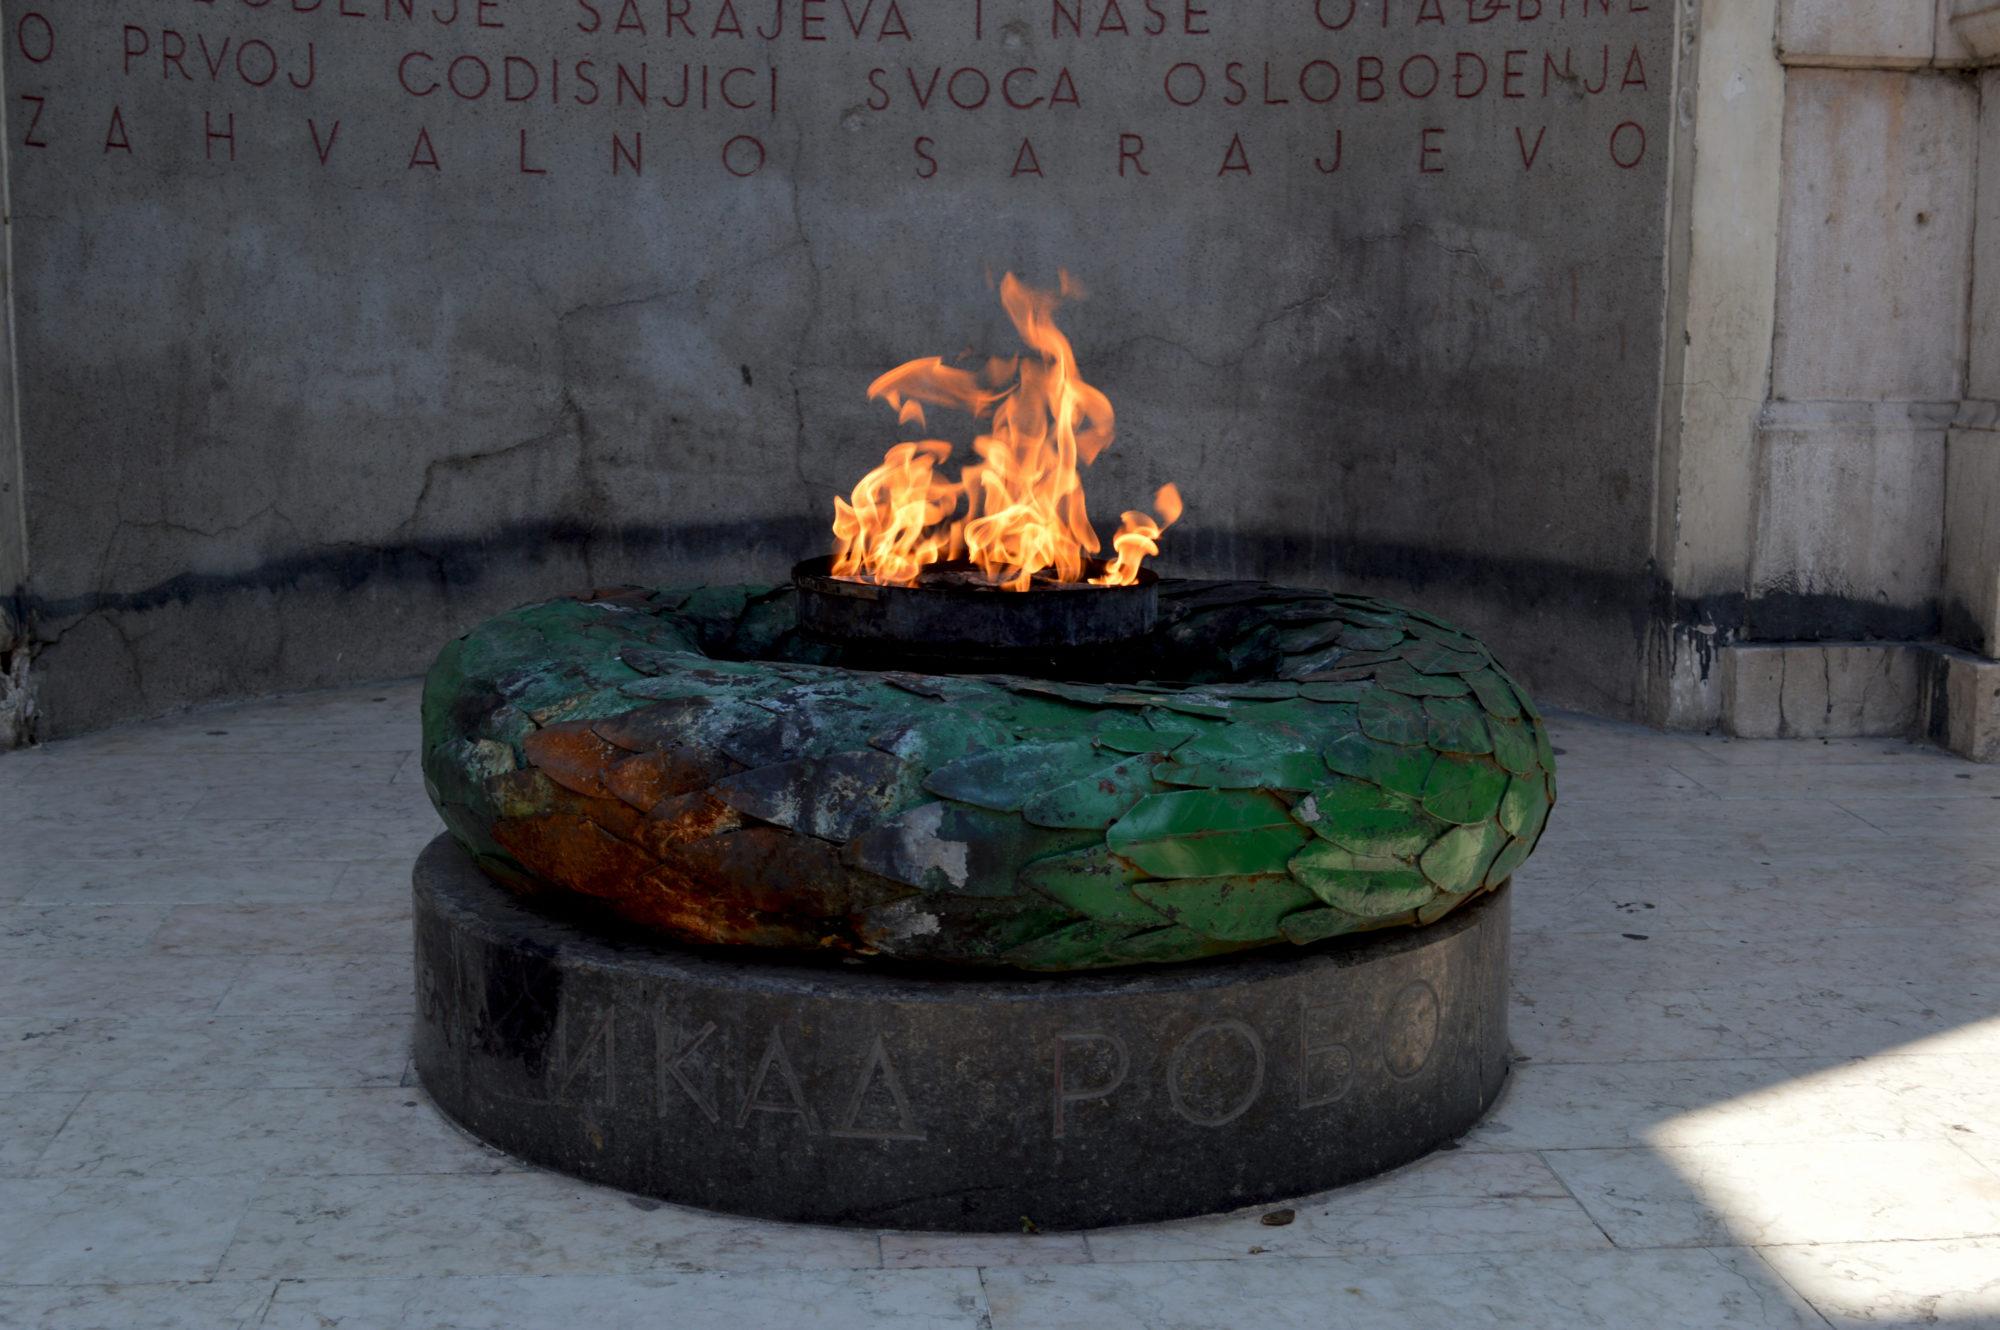 sarajevo-eternal-flame